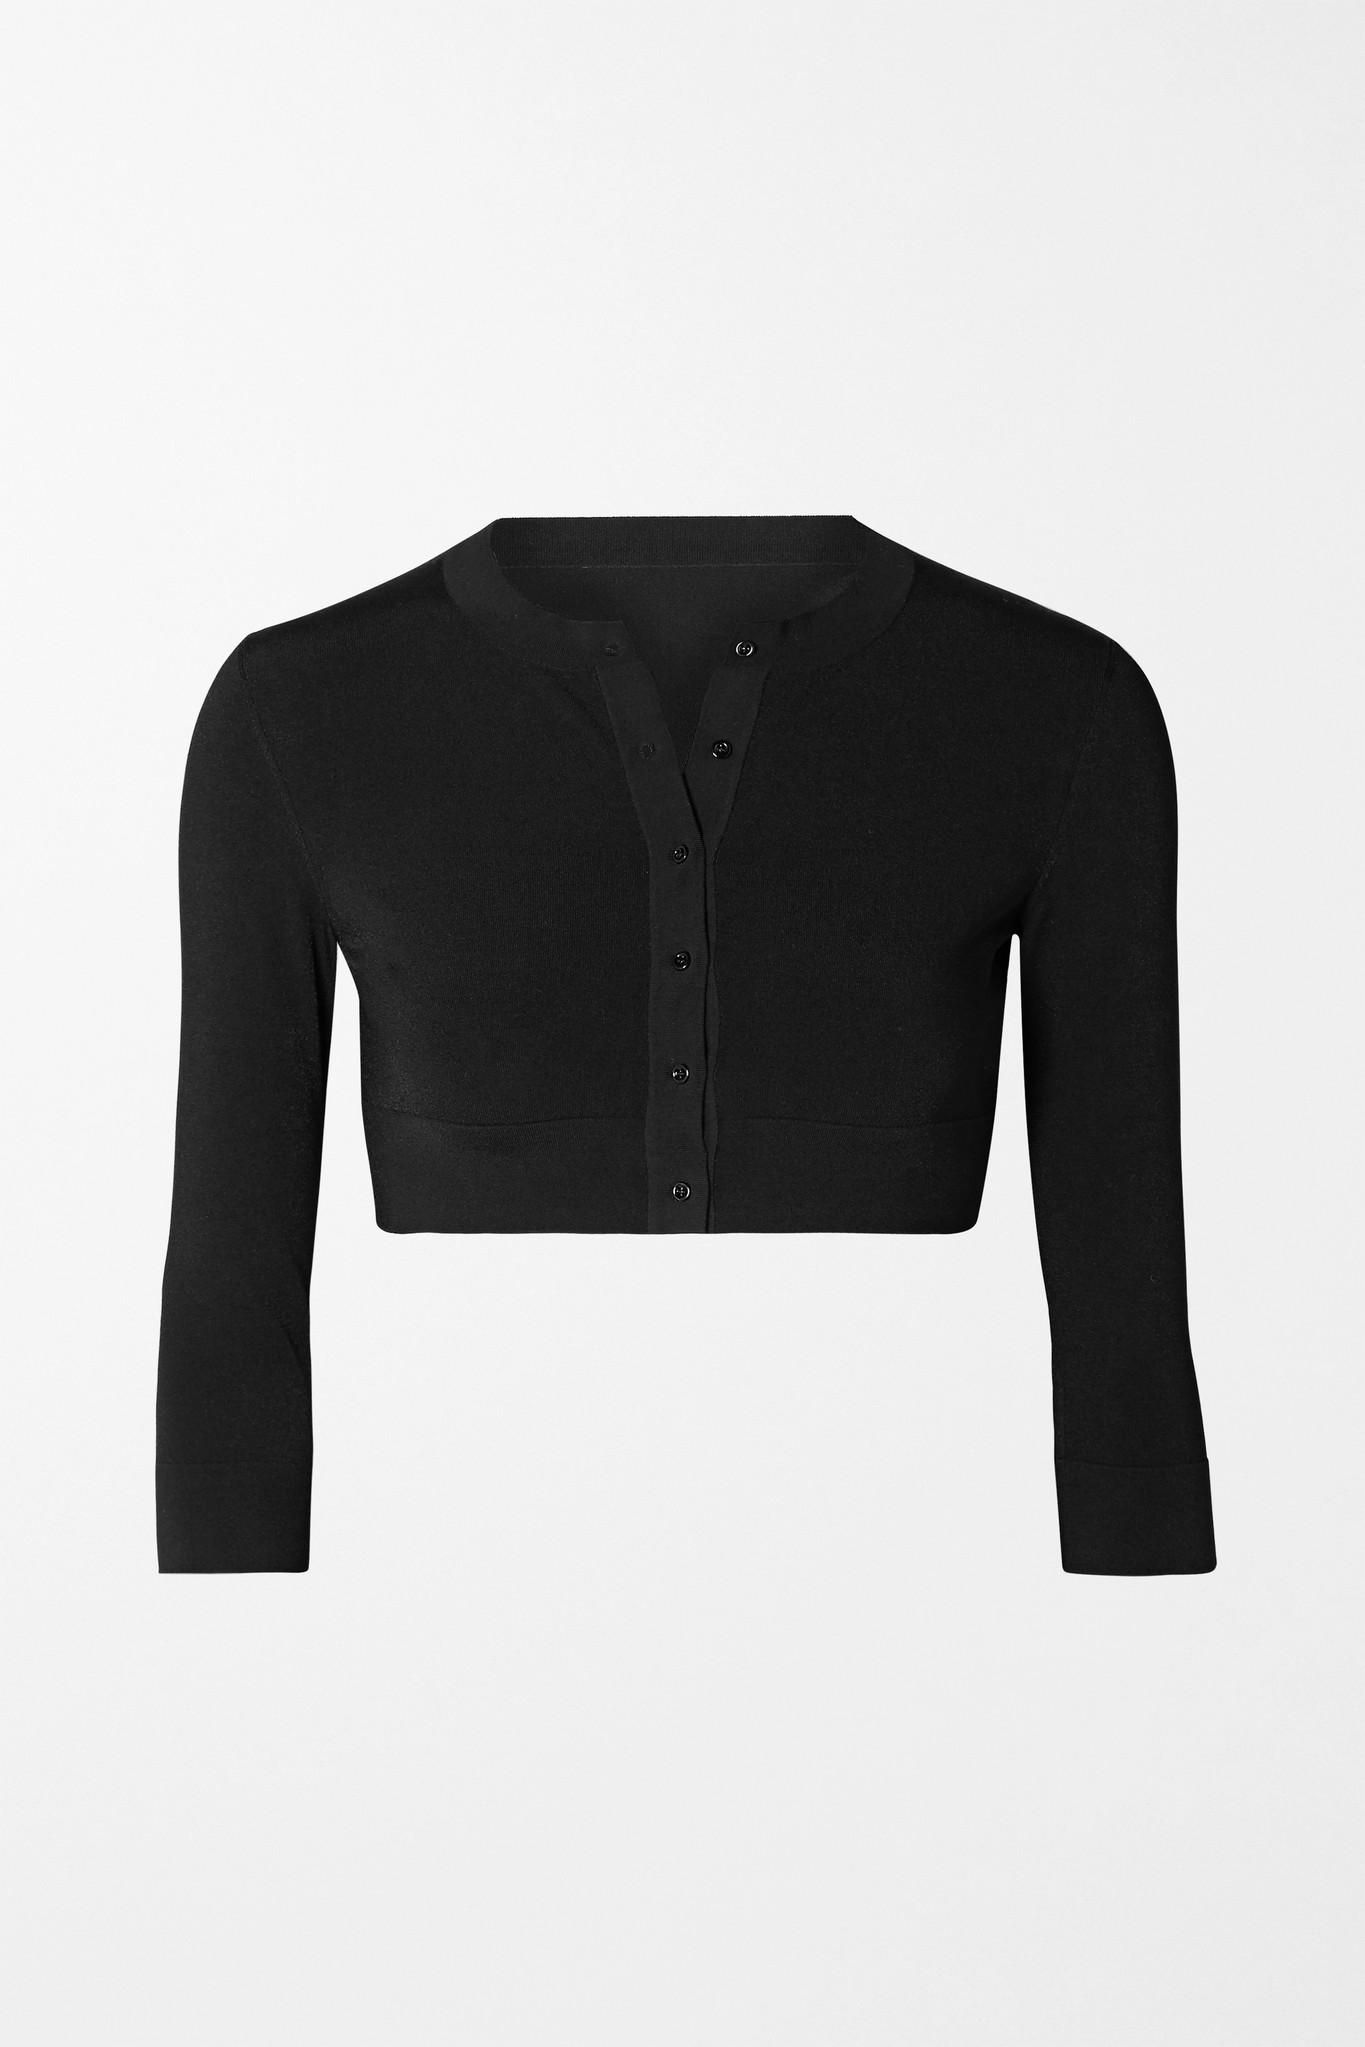 ALAÏA - Cropped Wool-blend Cardigan - Black - FR36